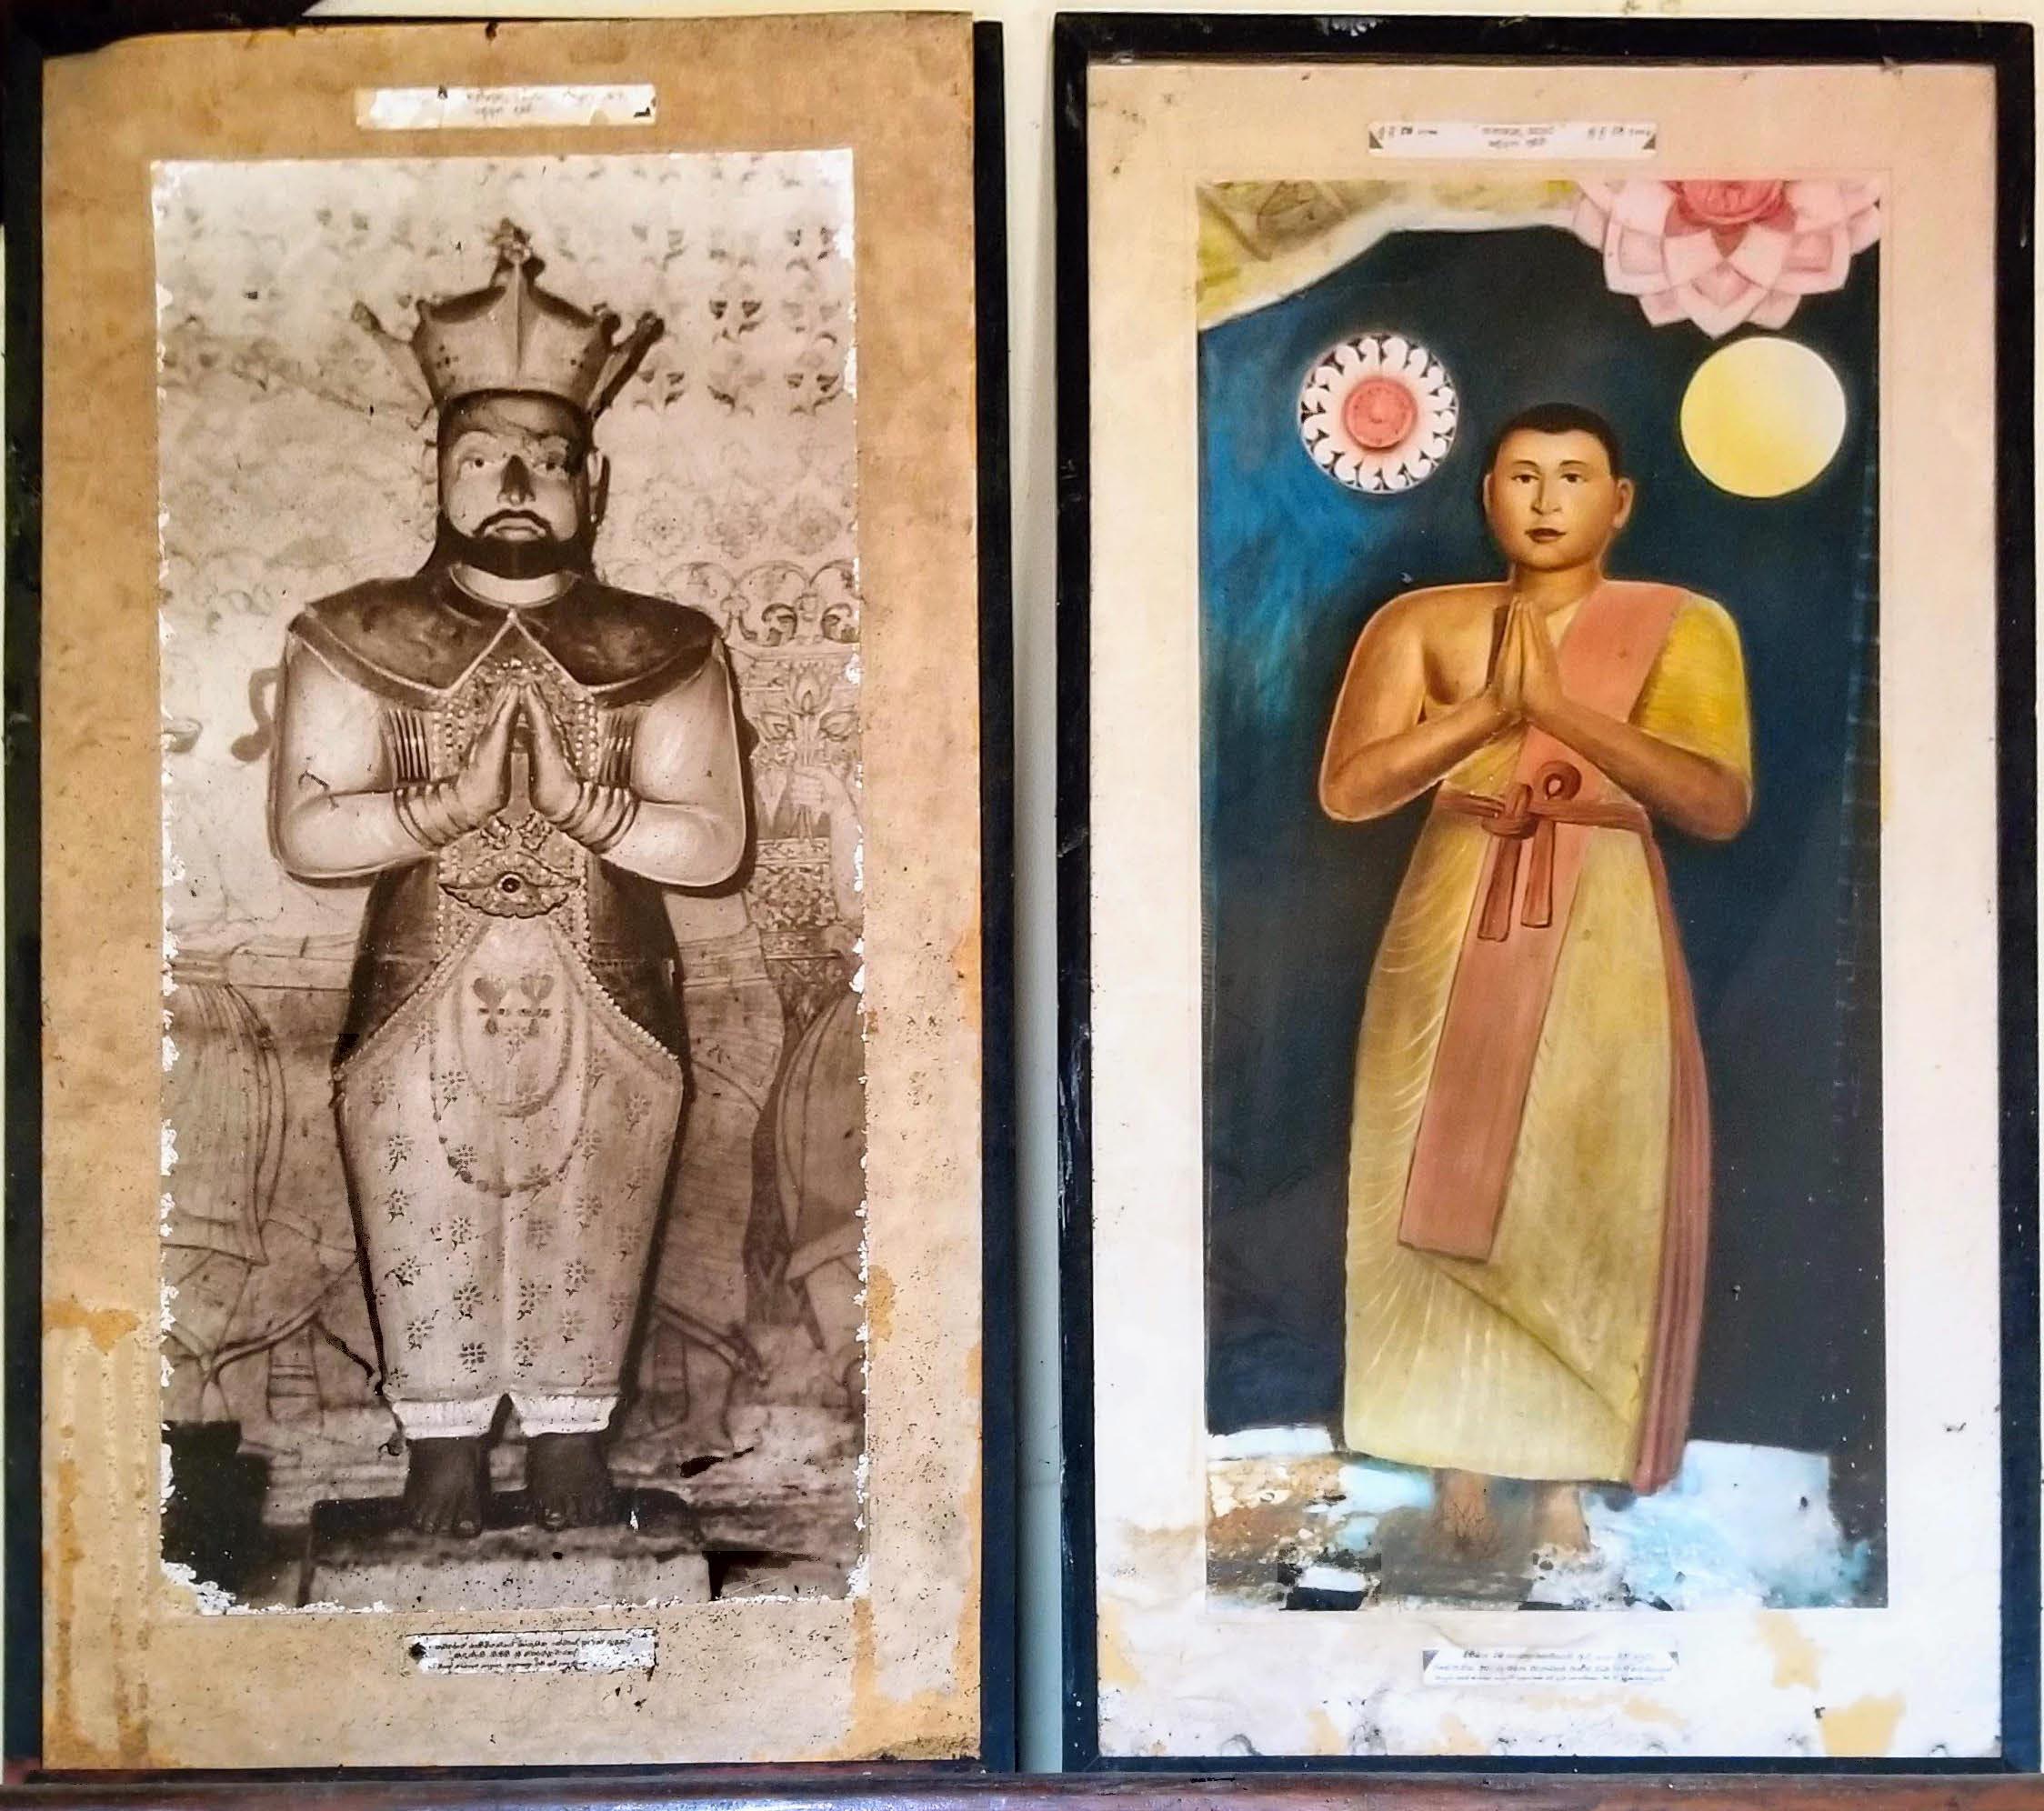 Buddhist temple portraits of Kīrti Śrī and Saraṇaṅkara